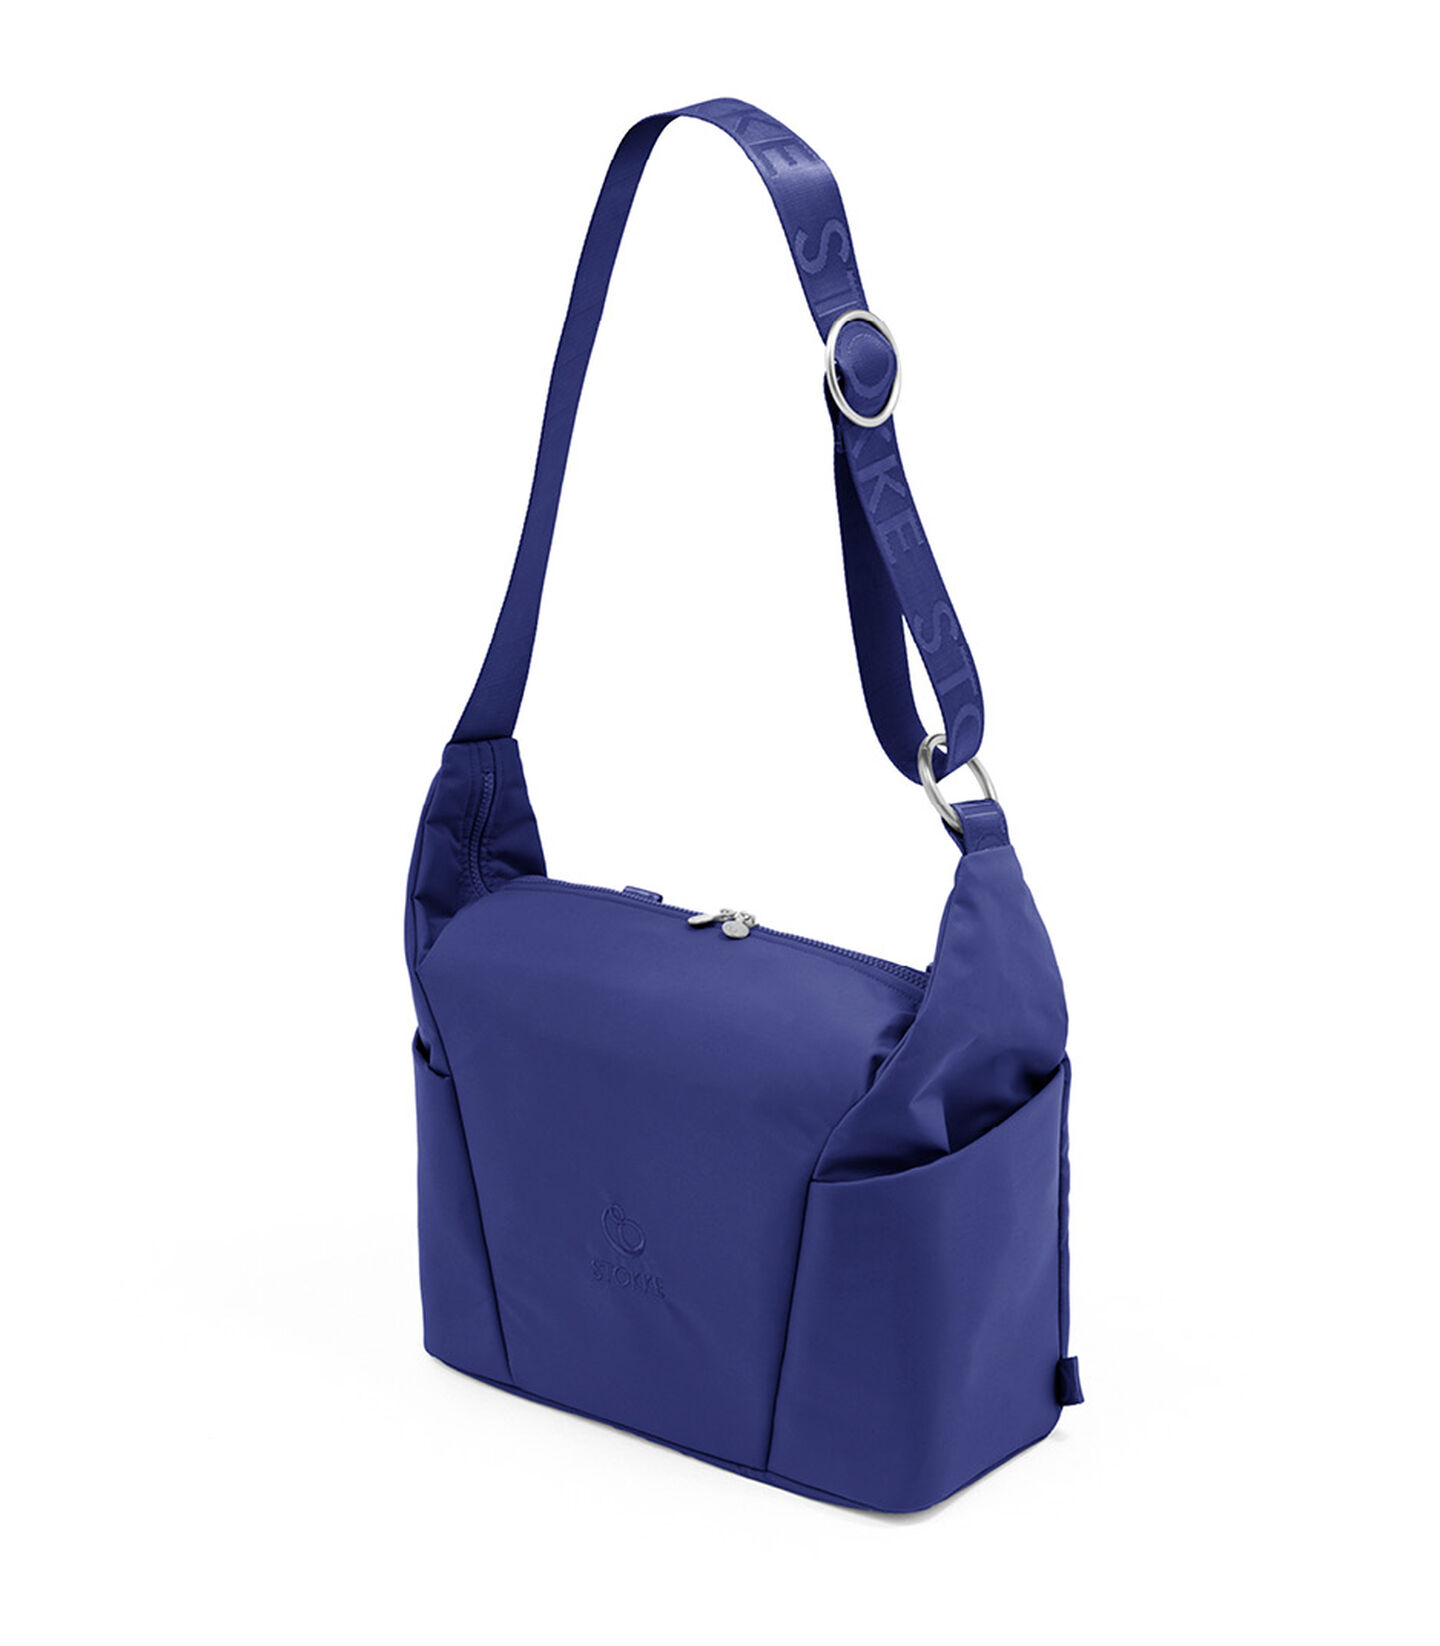 Stokke® Xplory® X-skötväska Royal Blue, Royal Blue, mainview view 2